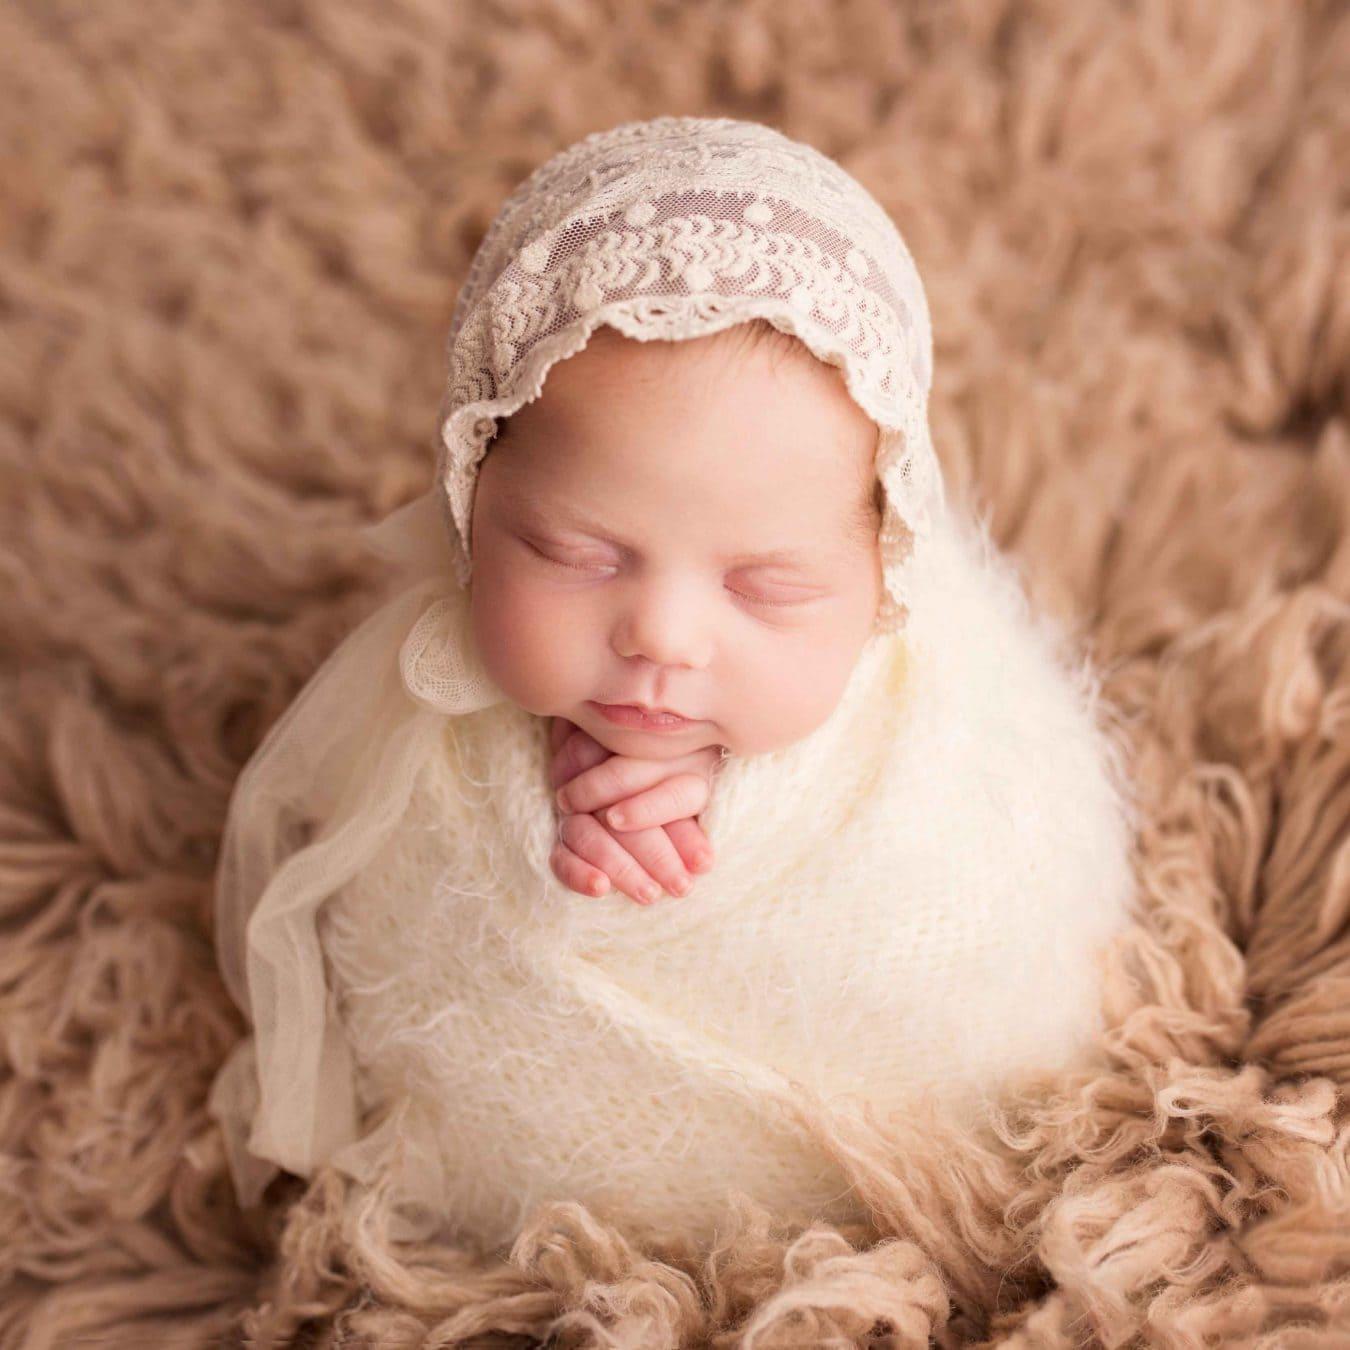 Pack bebe newborn embarazo marbella